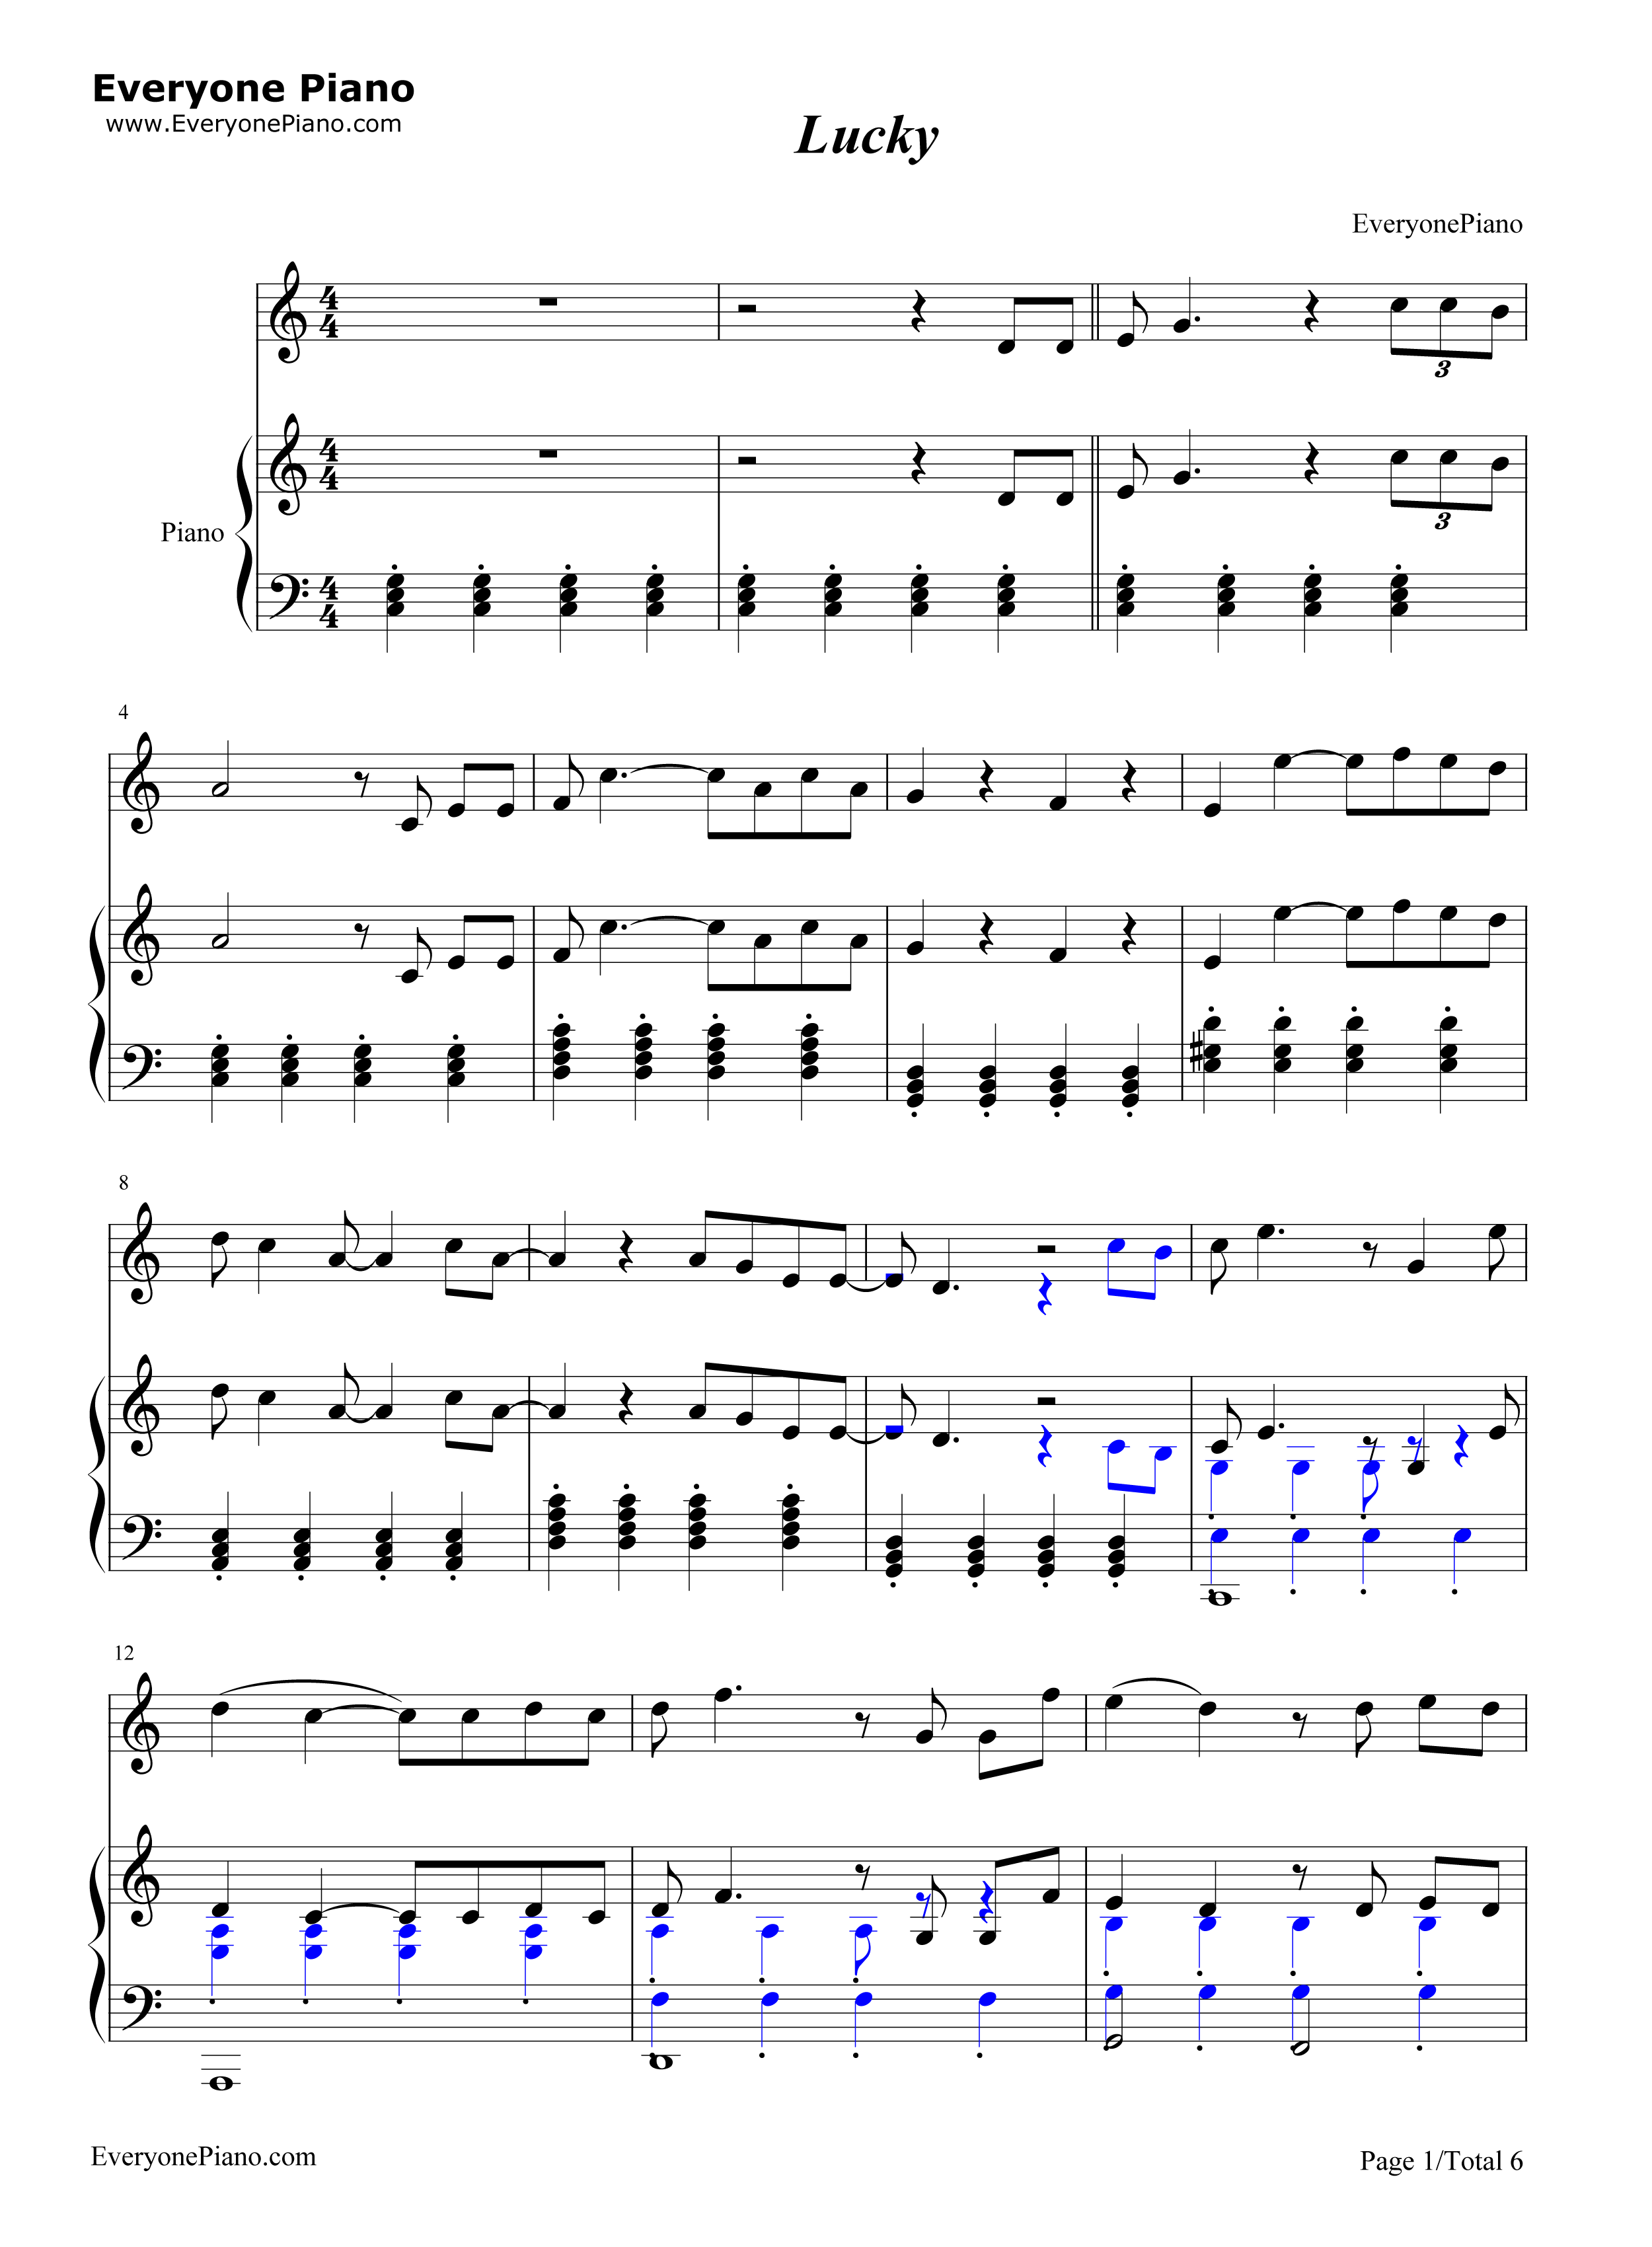 Jason mraz lucky guitar